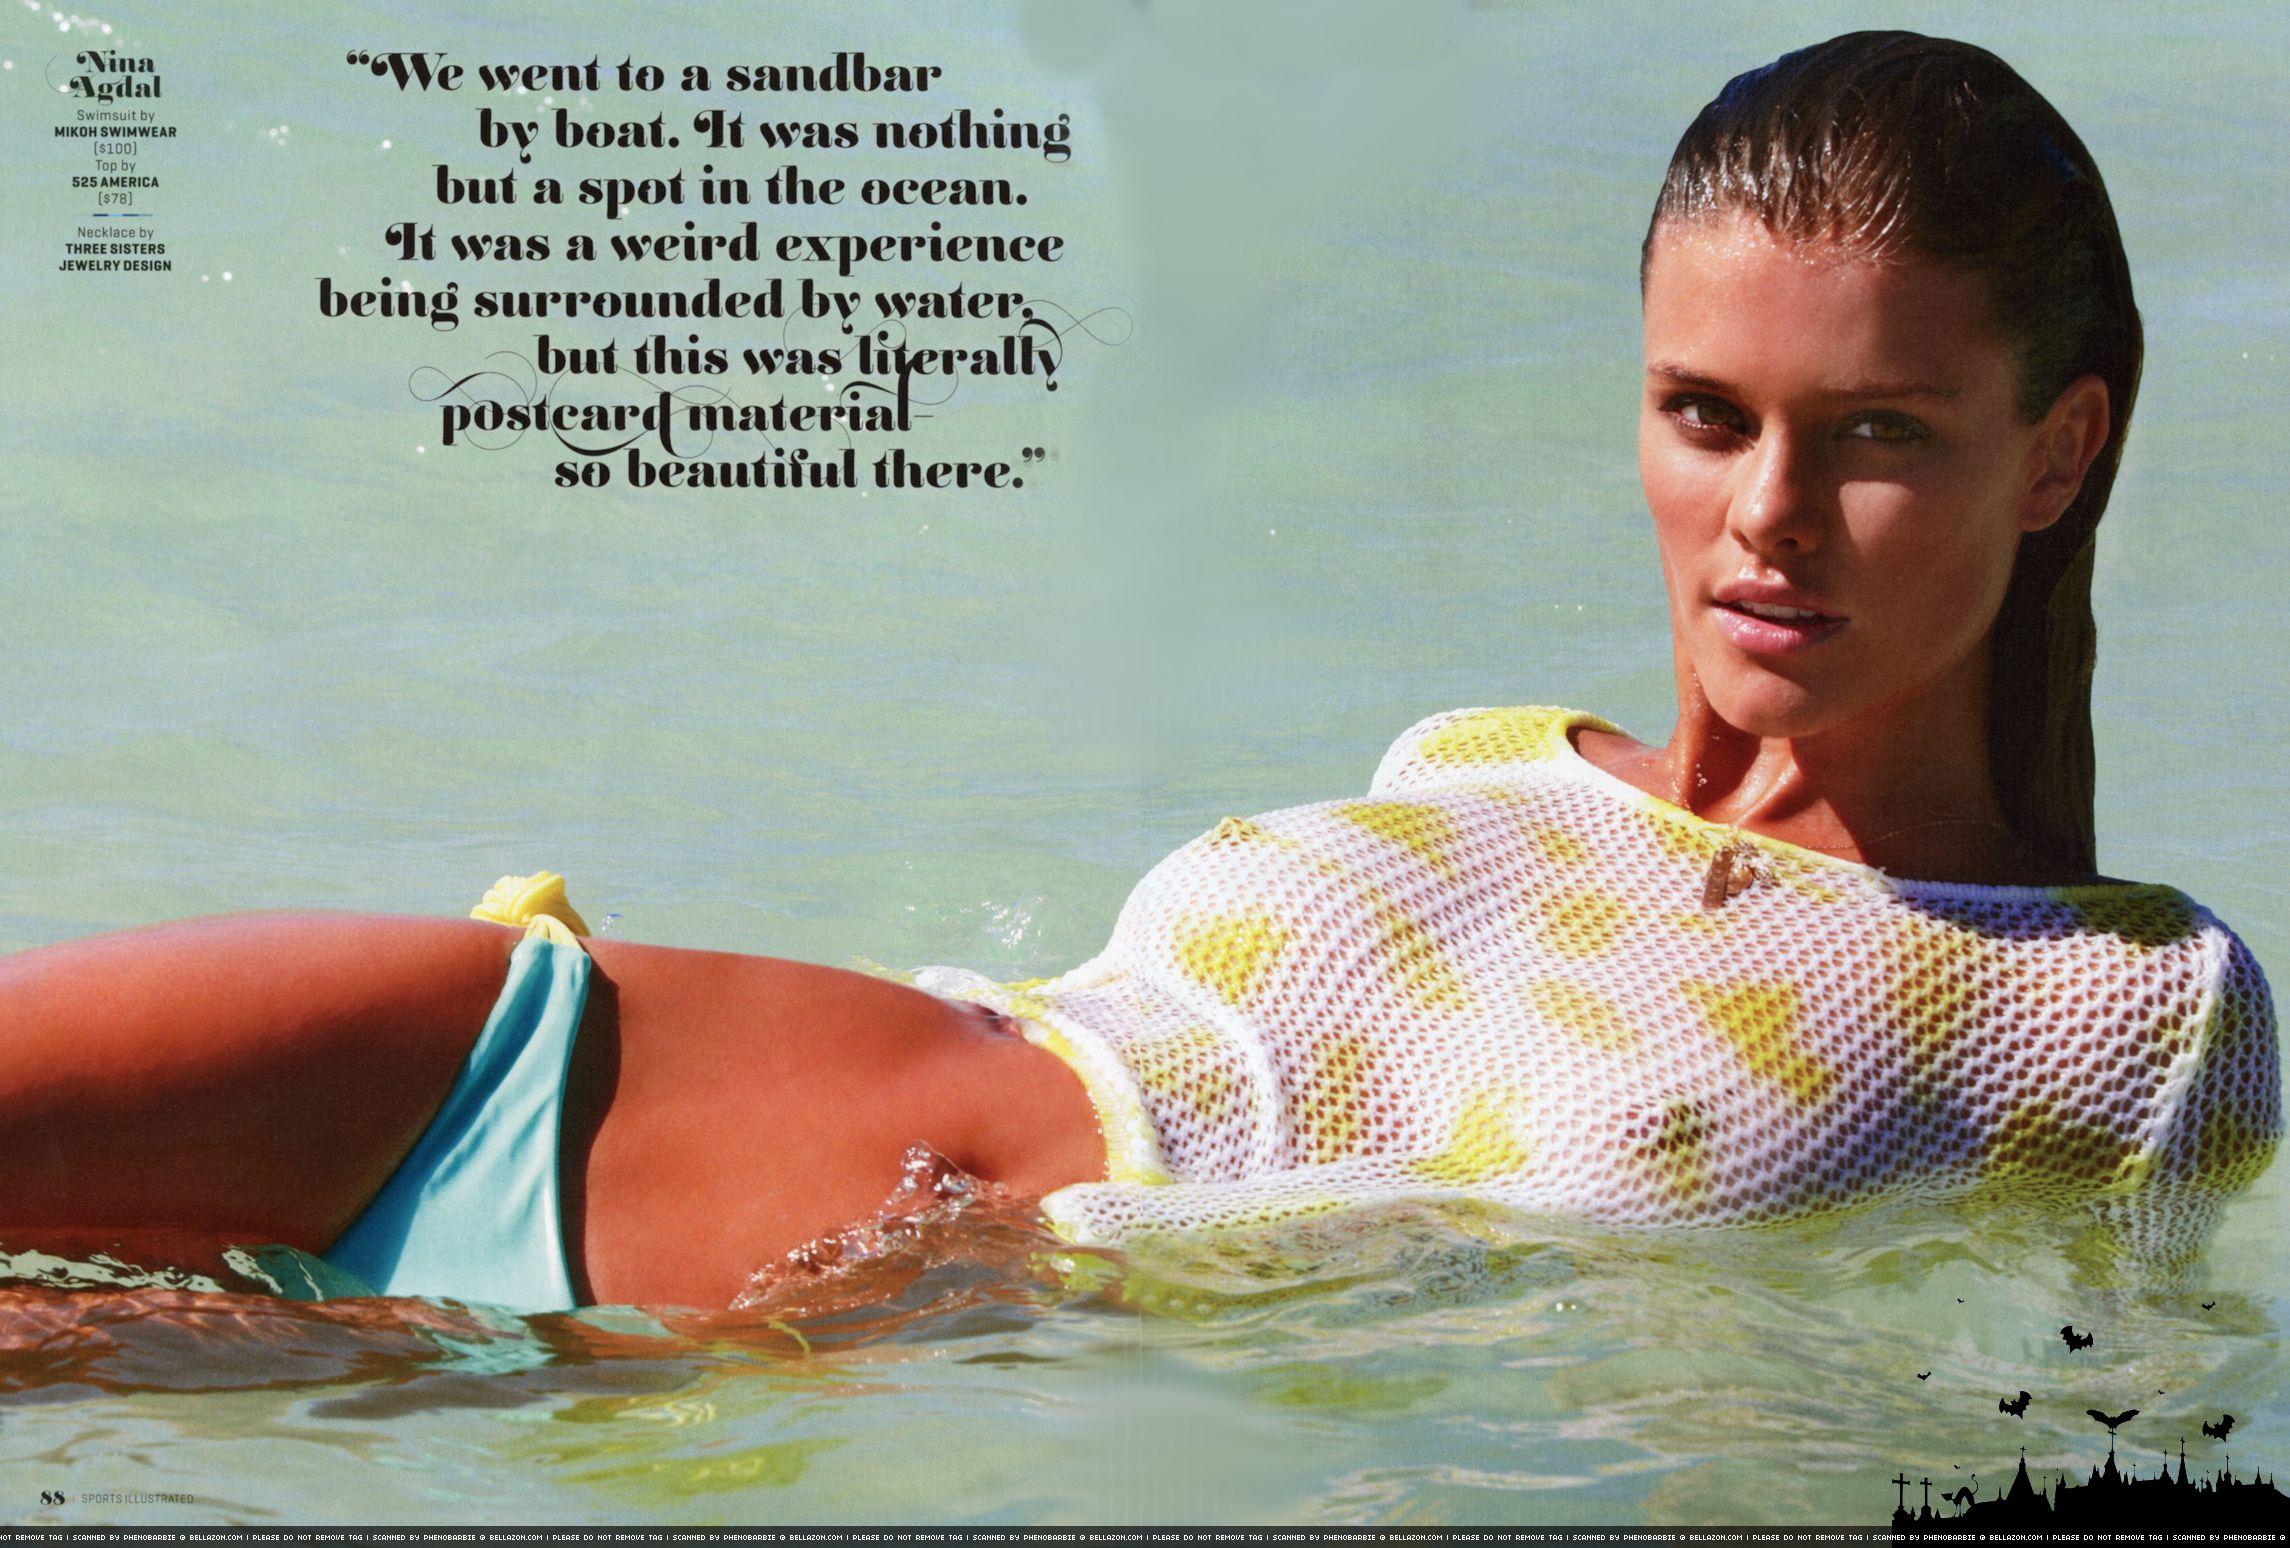 nina-agdal-si-swimsuit-2013-print-06